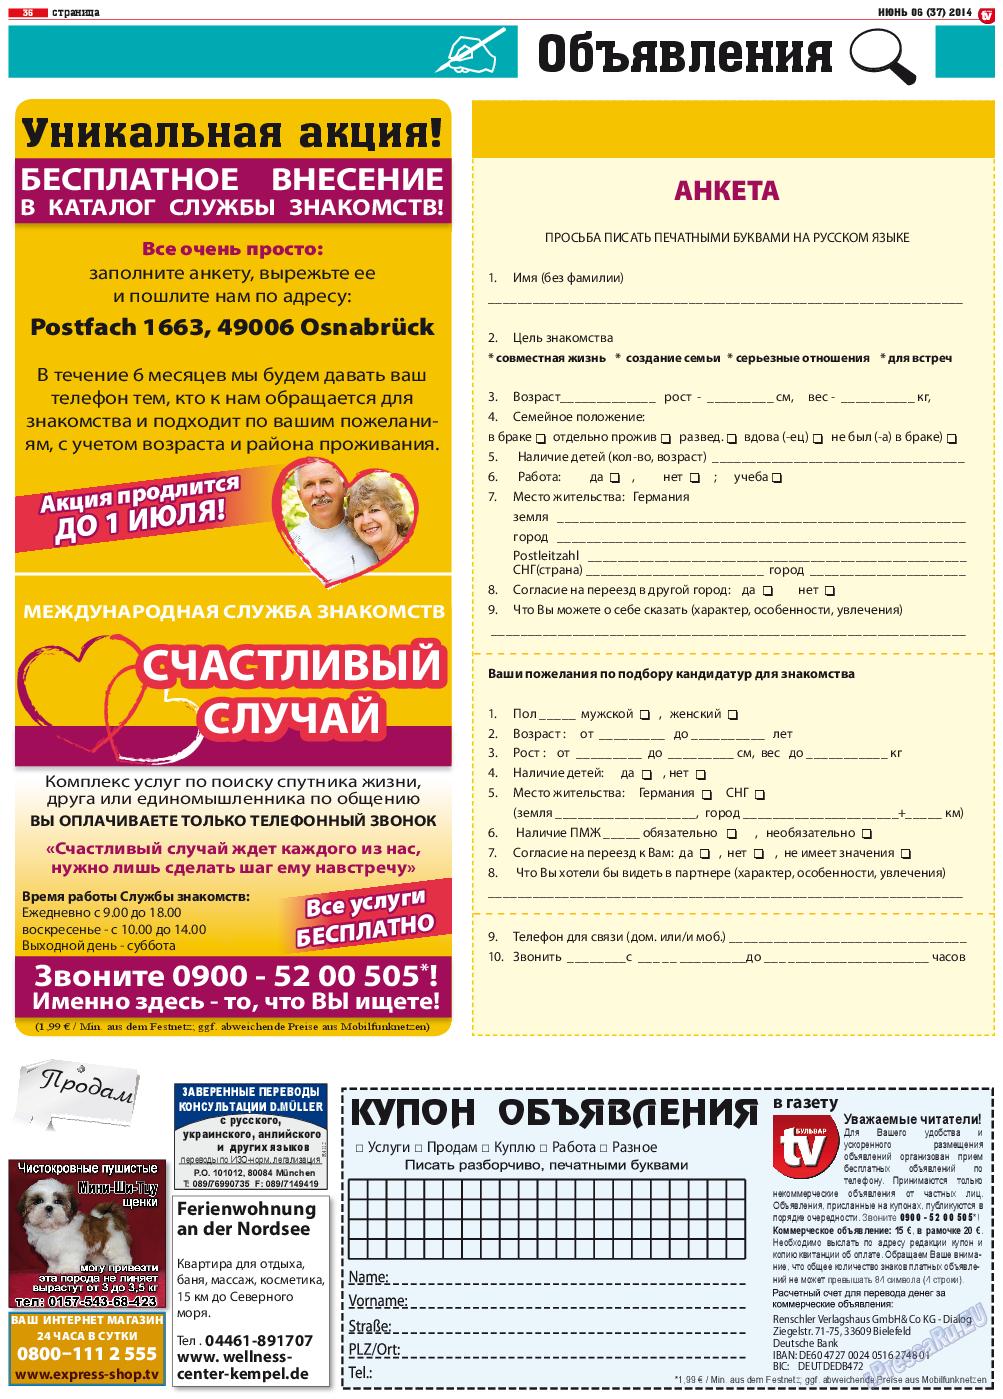 днепропетровск знакомств газета служба